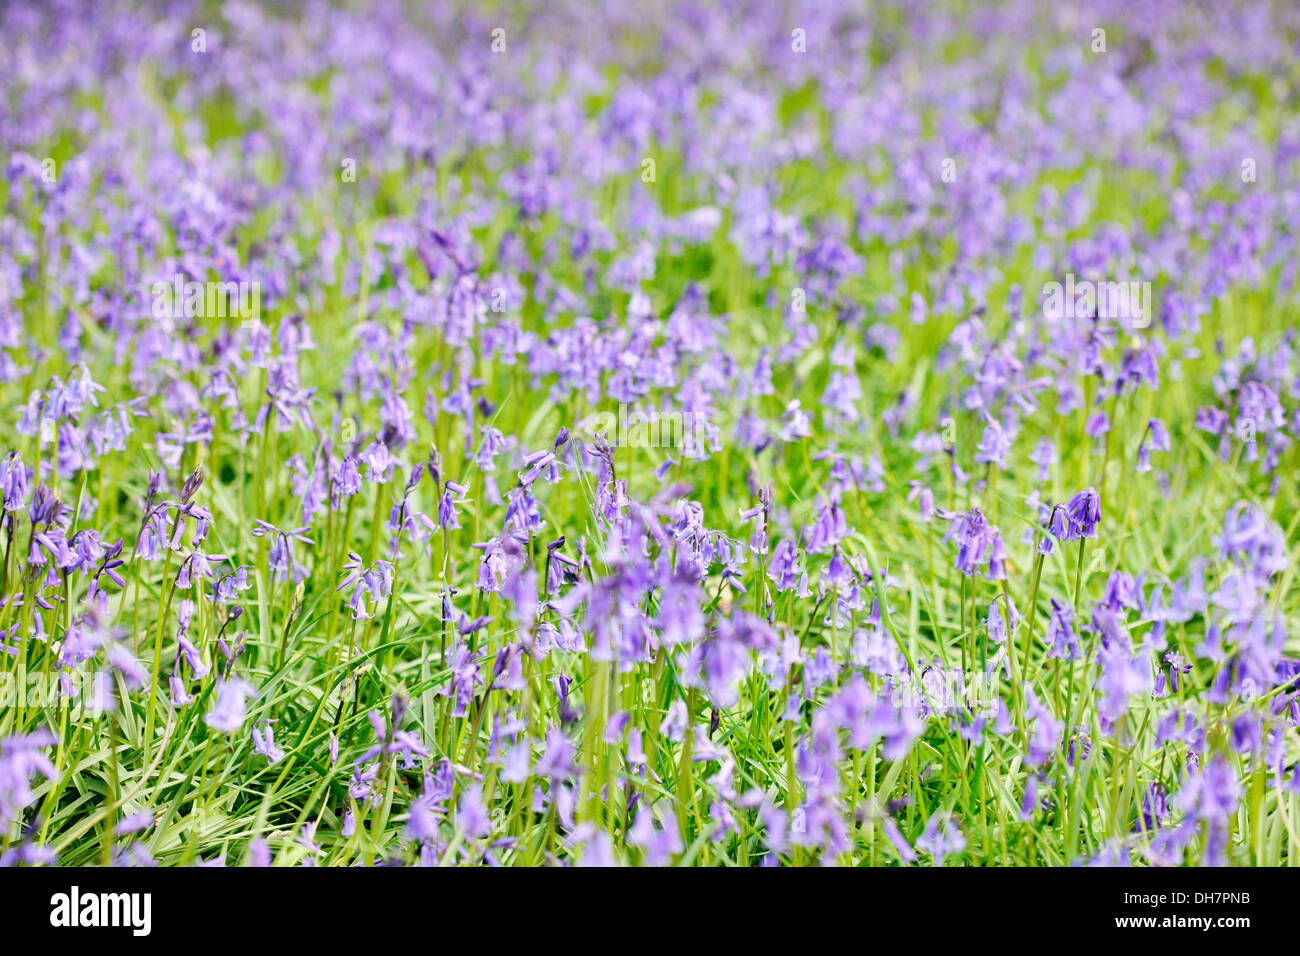 gorgeous may bluebells  Jane Ann Butler Photography  JABP1008 Stock Photo